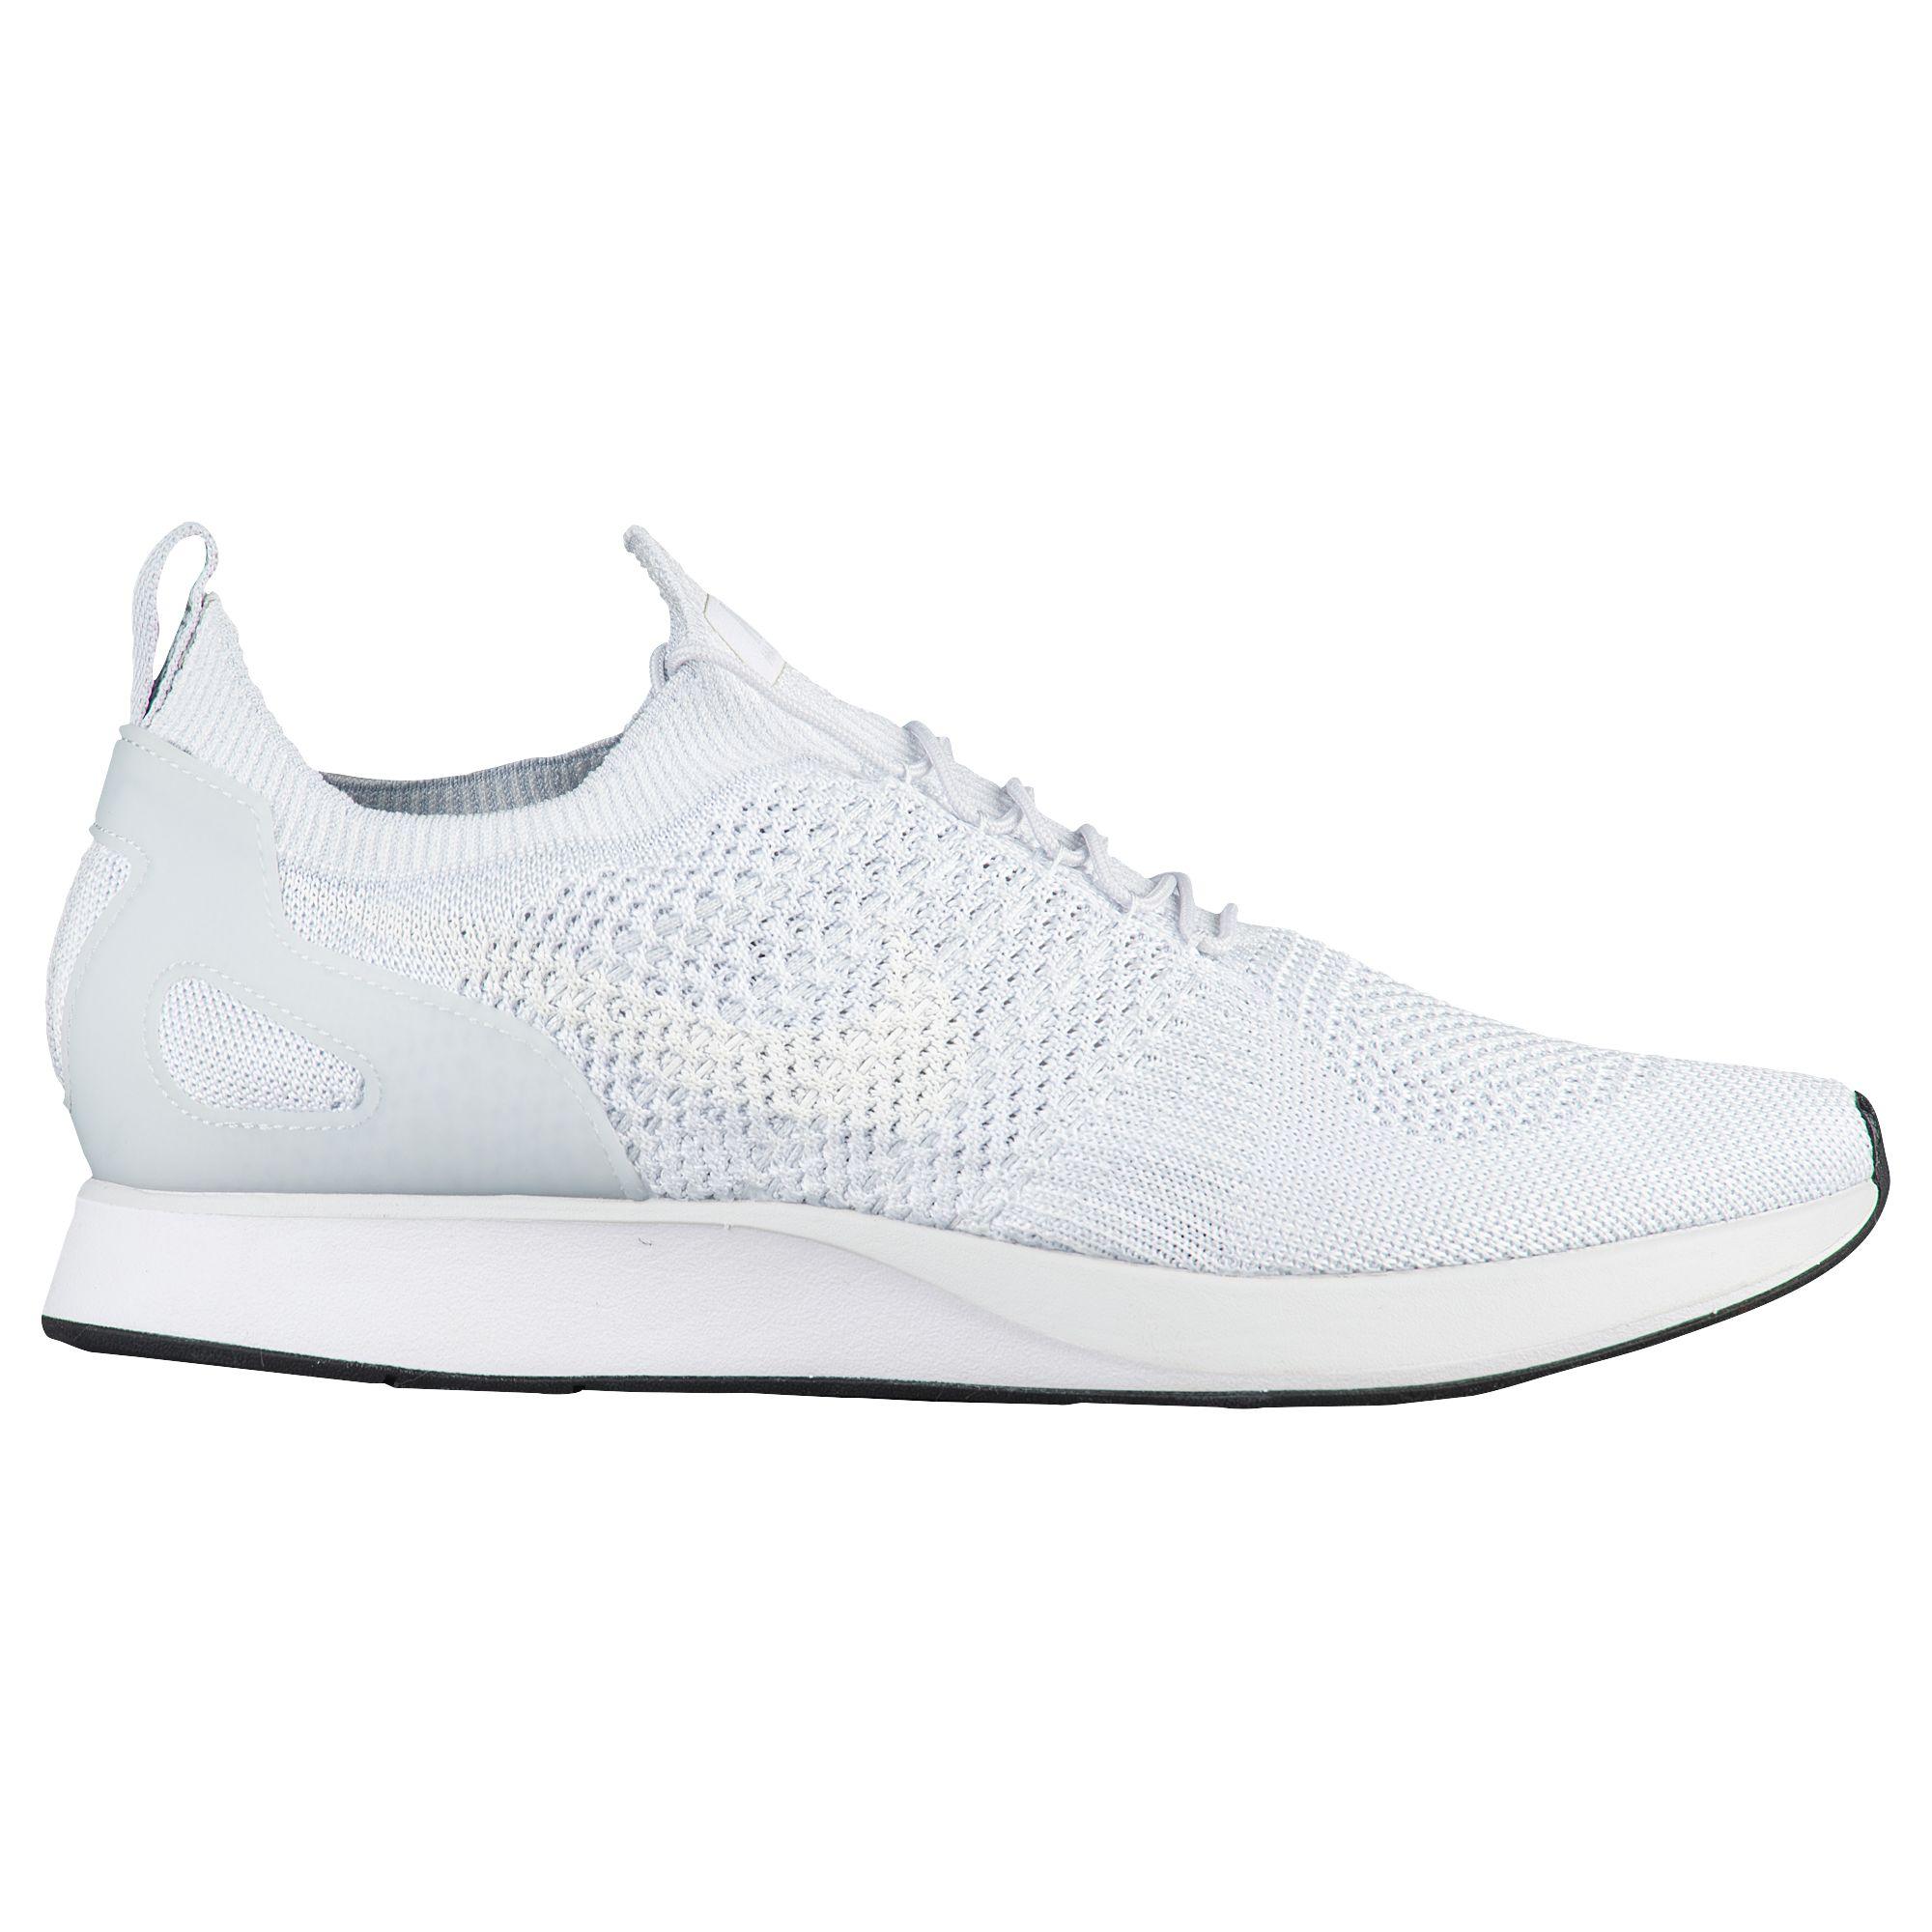 Nike Coureur Flyknit Mariah Doga Blanc sortie d'usine rabais rPVlr